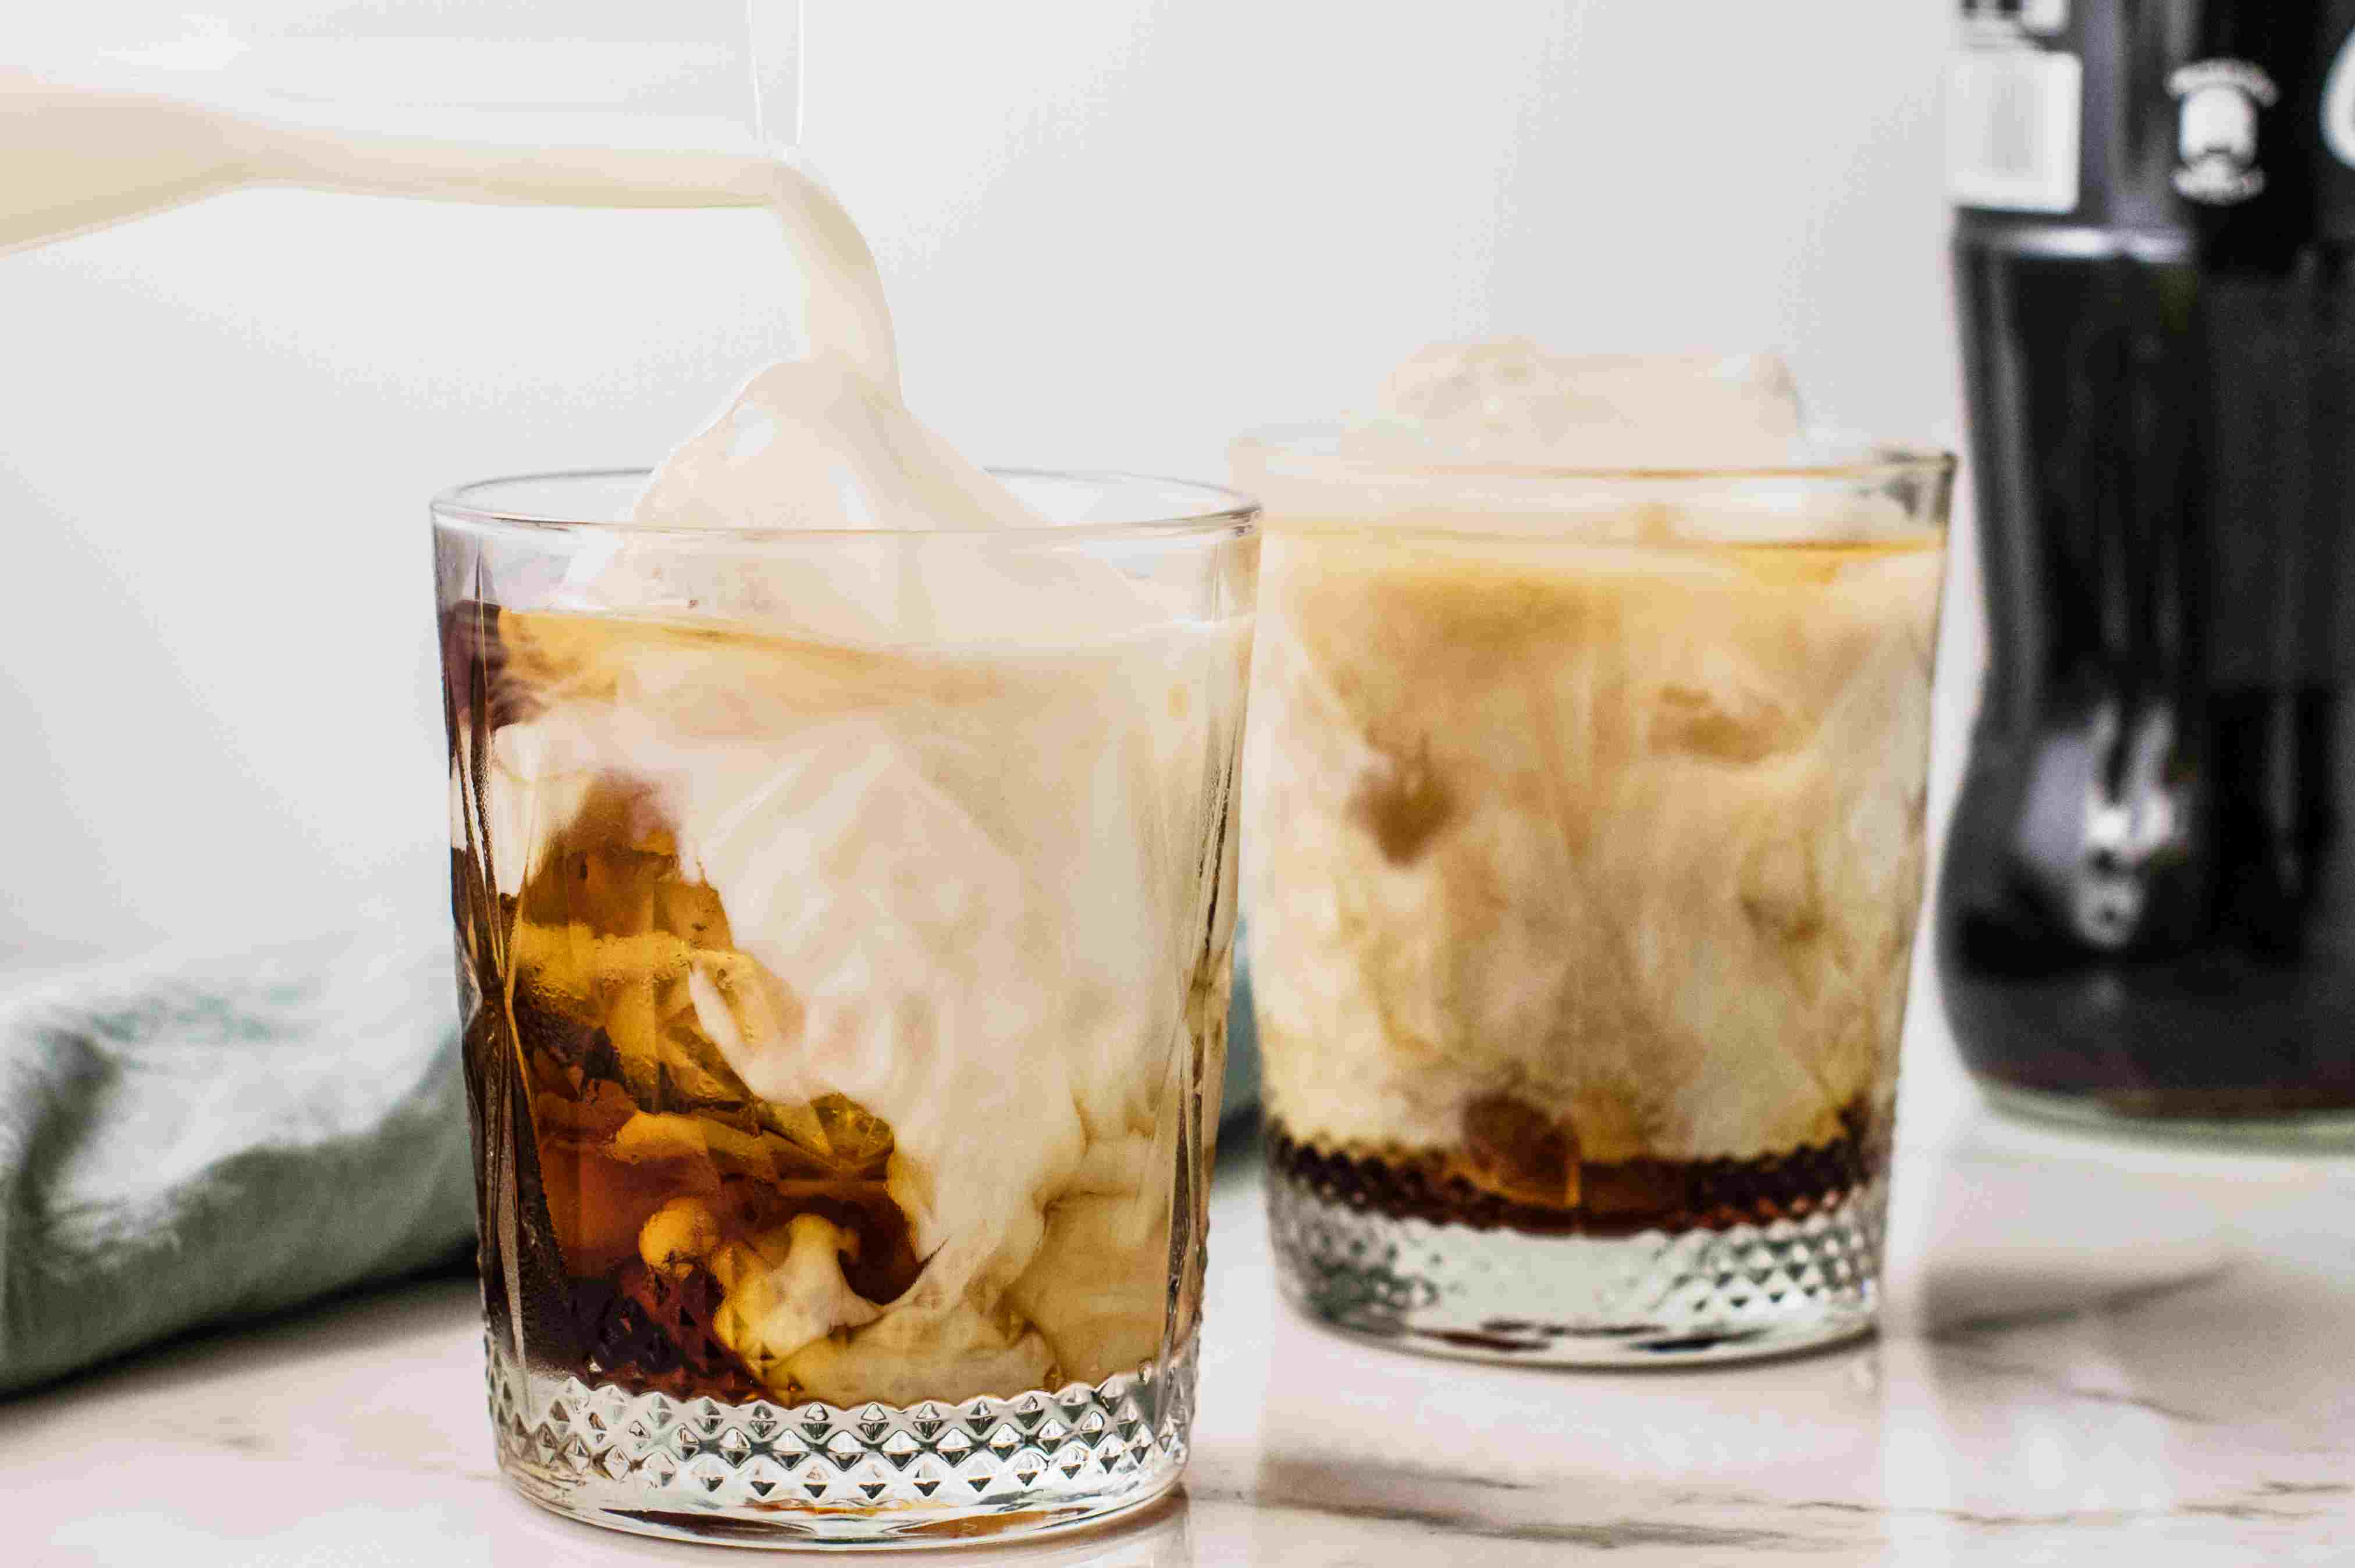 Cream and cola added to Colorado bulldog cocktail